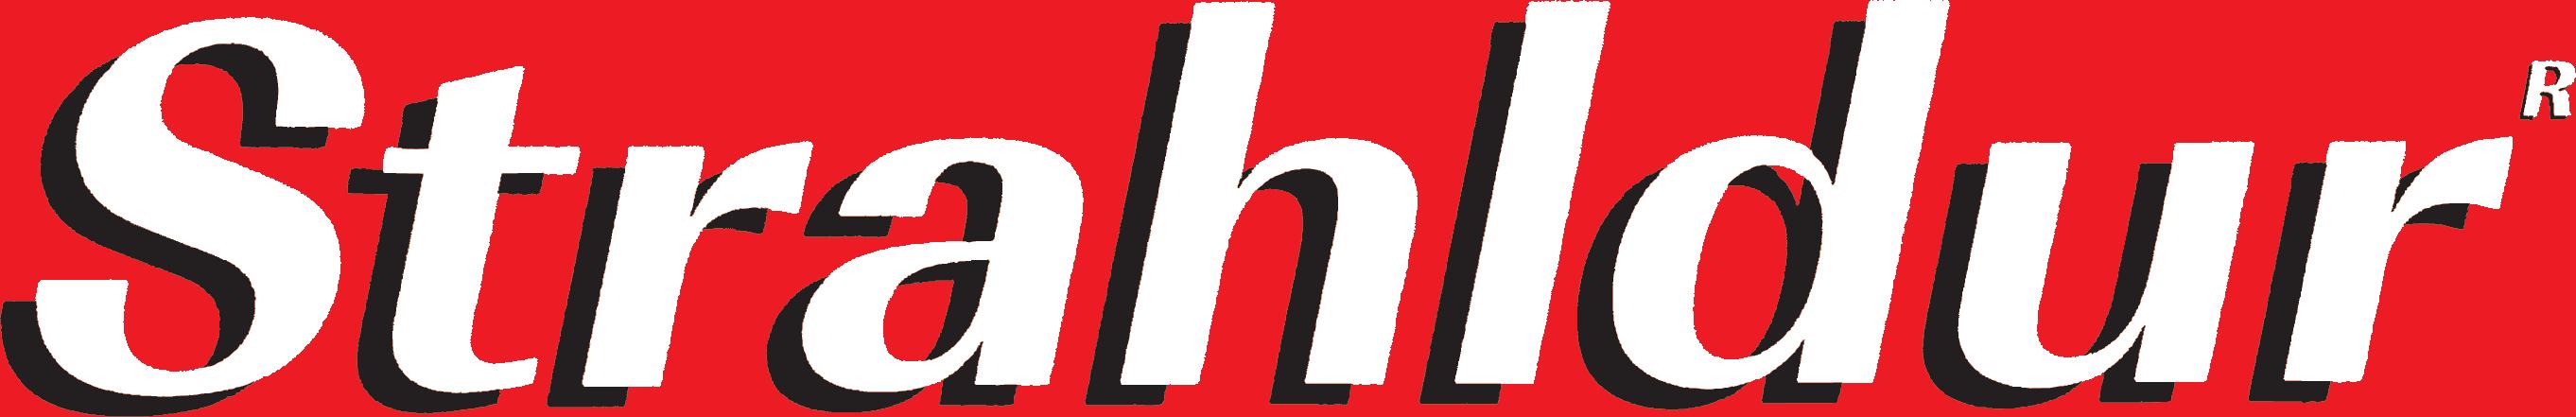 strahldur logo